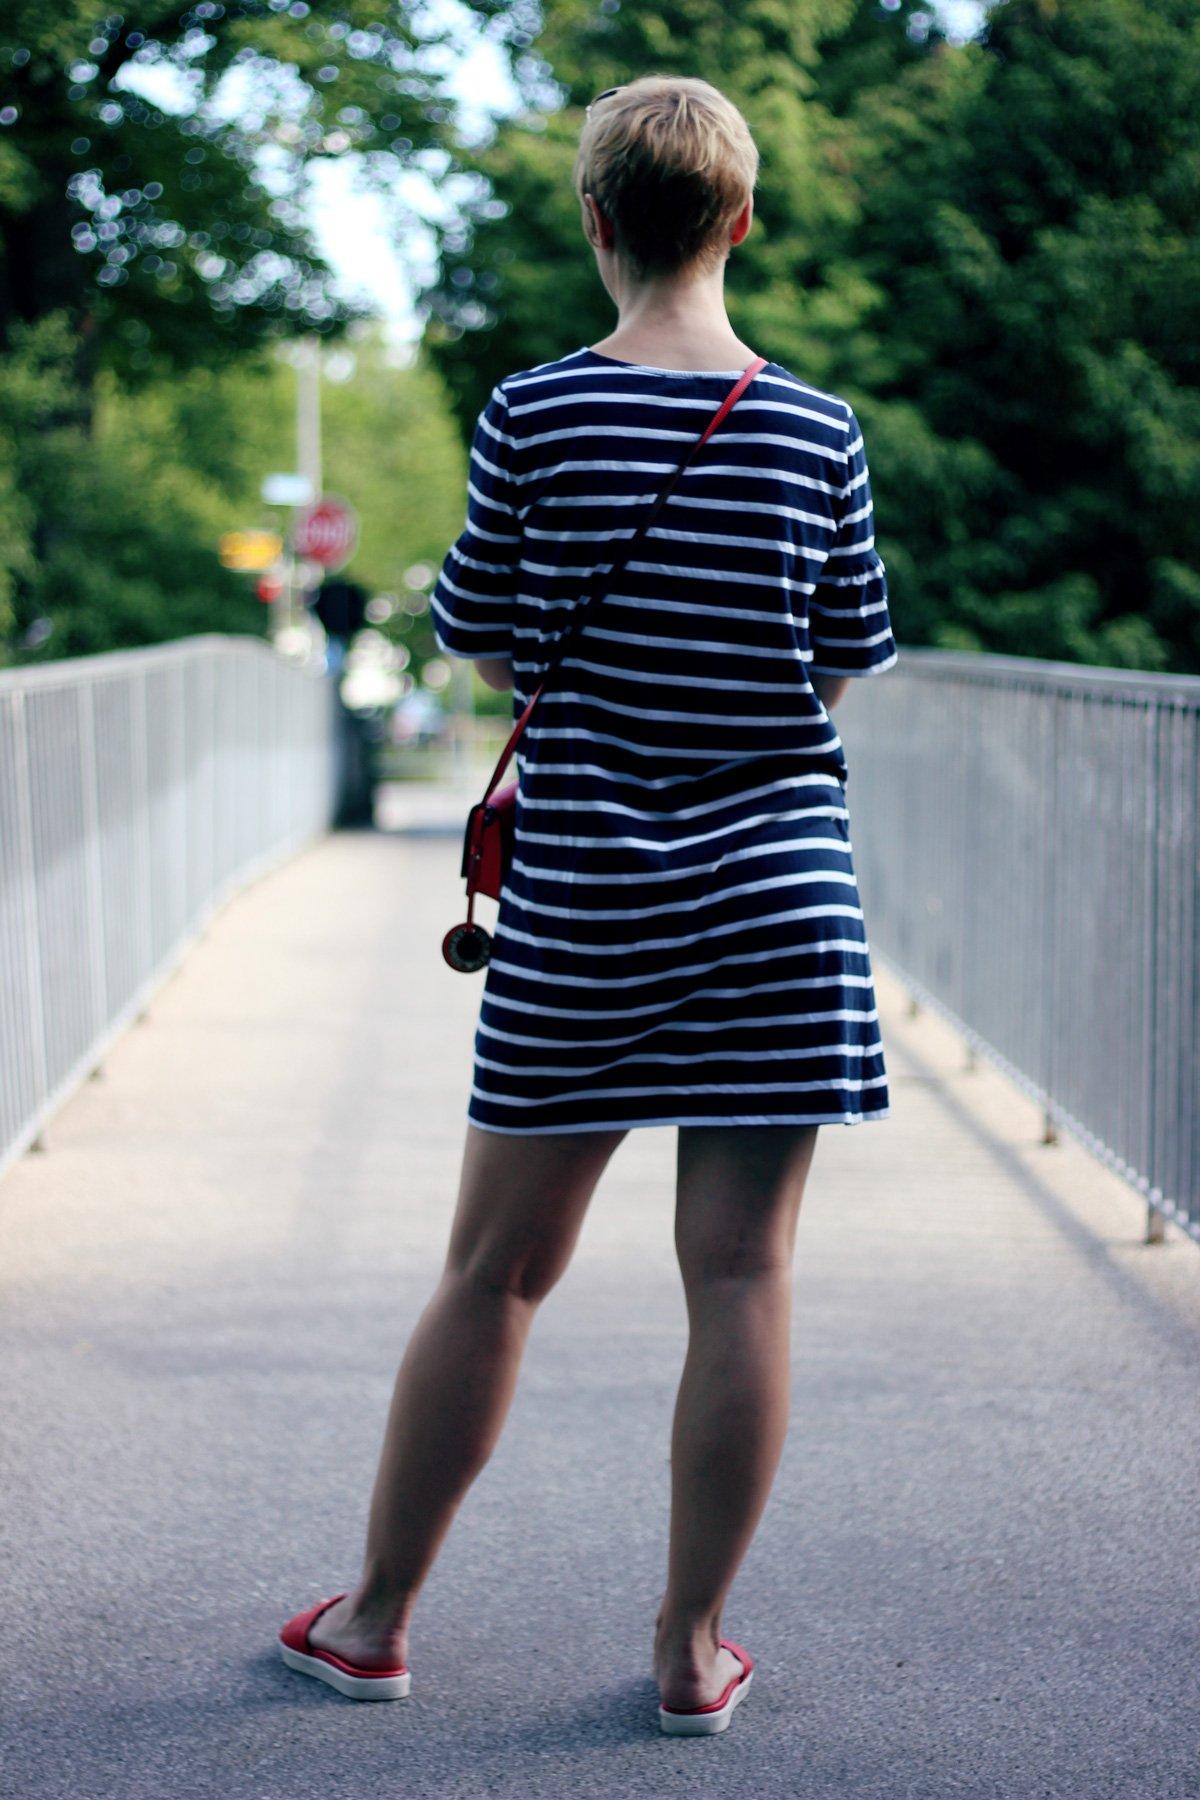 Conny Doll Lifestyle: Streifenkleid, rote Details, Pantoletten, DKNY, Tchibo, Armani, blau, weiß, rot